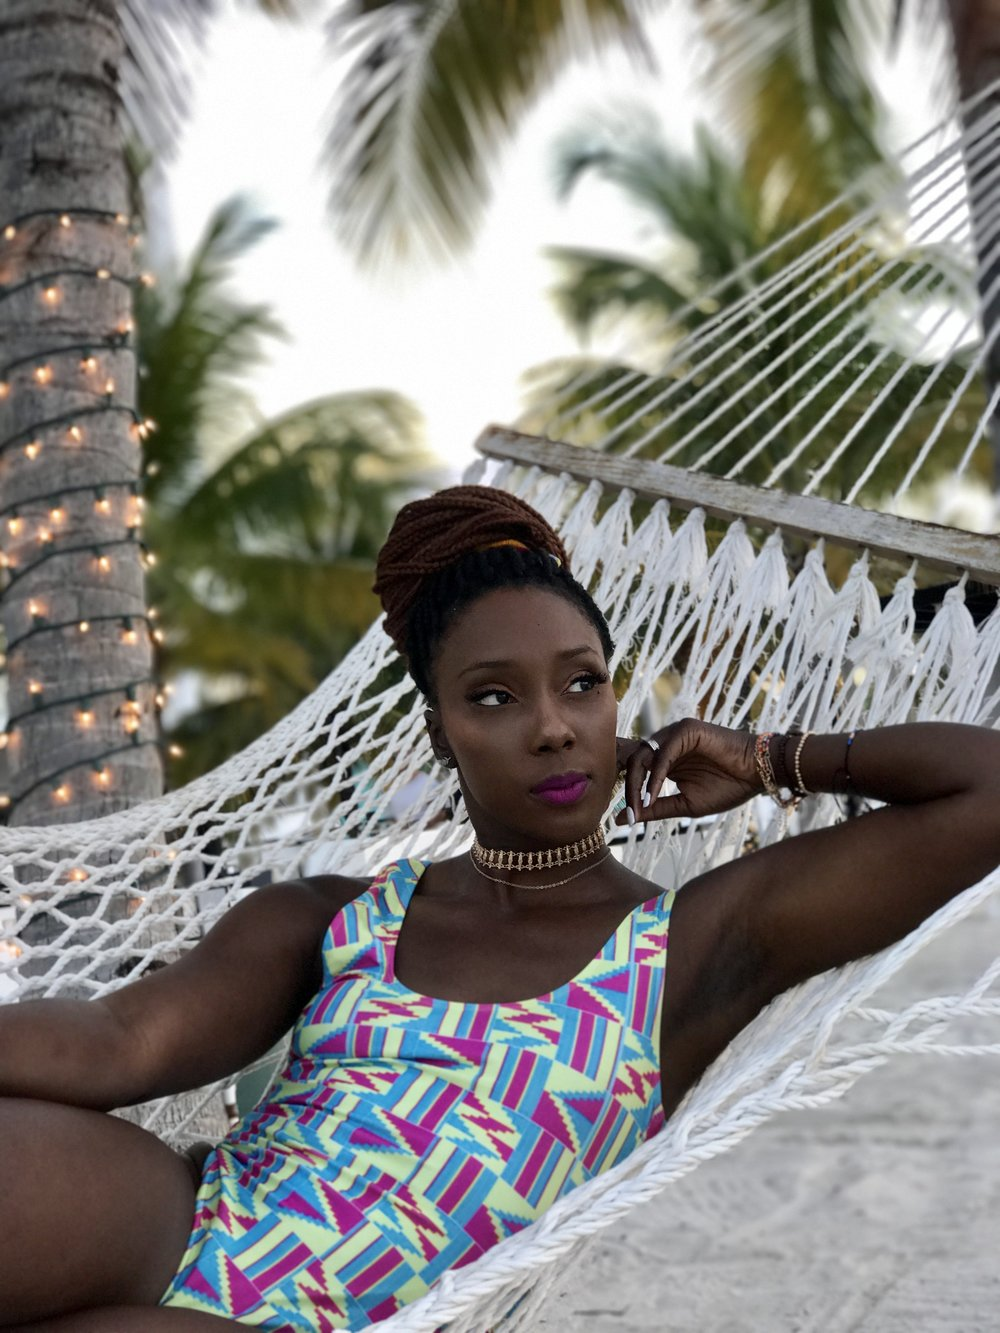 Aude-Dayna-Bolden-aude-swim-Jamaica-travel-trip1.jpg